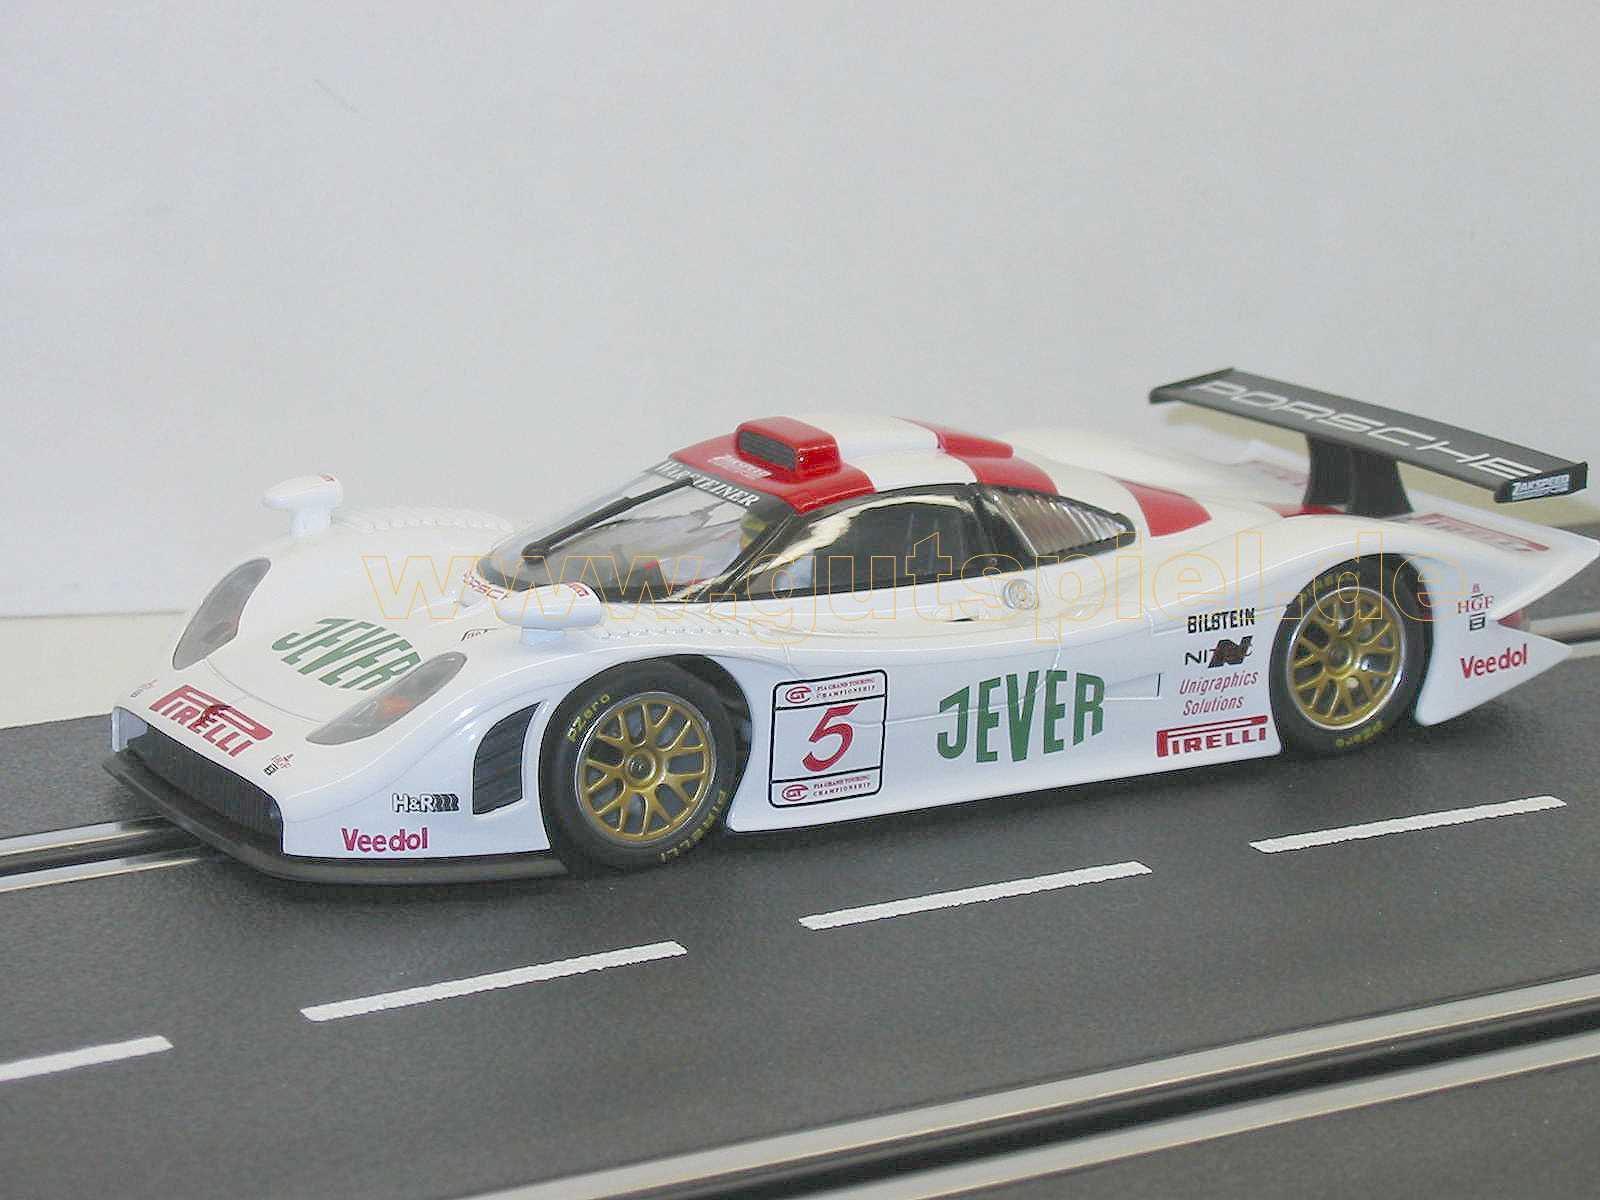 SICA23A_01 Fascinating Porsche 911 Gt1 Evo 98 Slot It Cars Trend